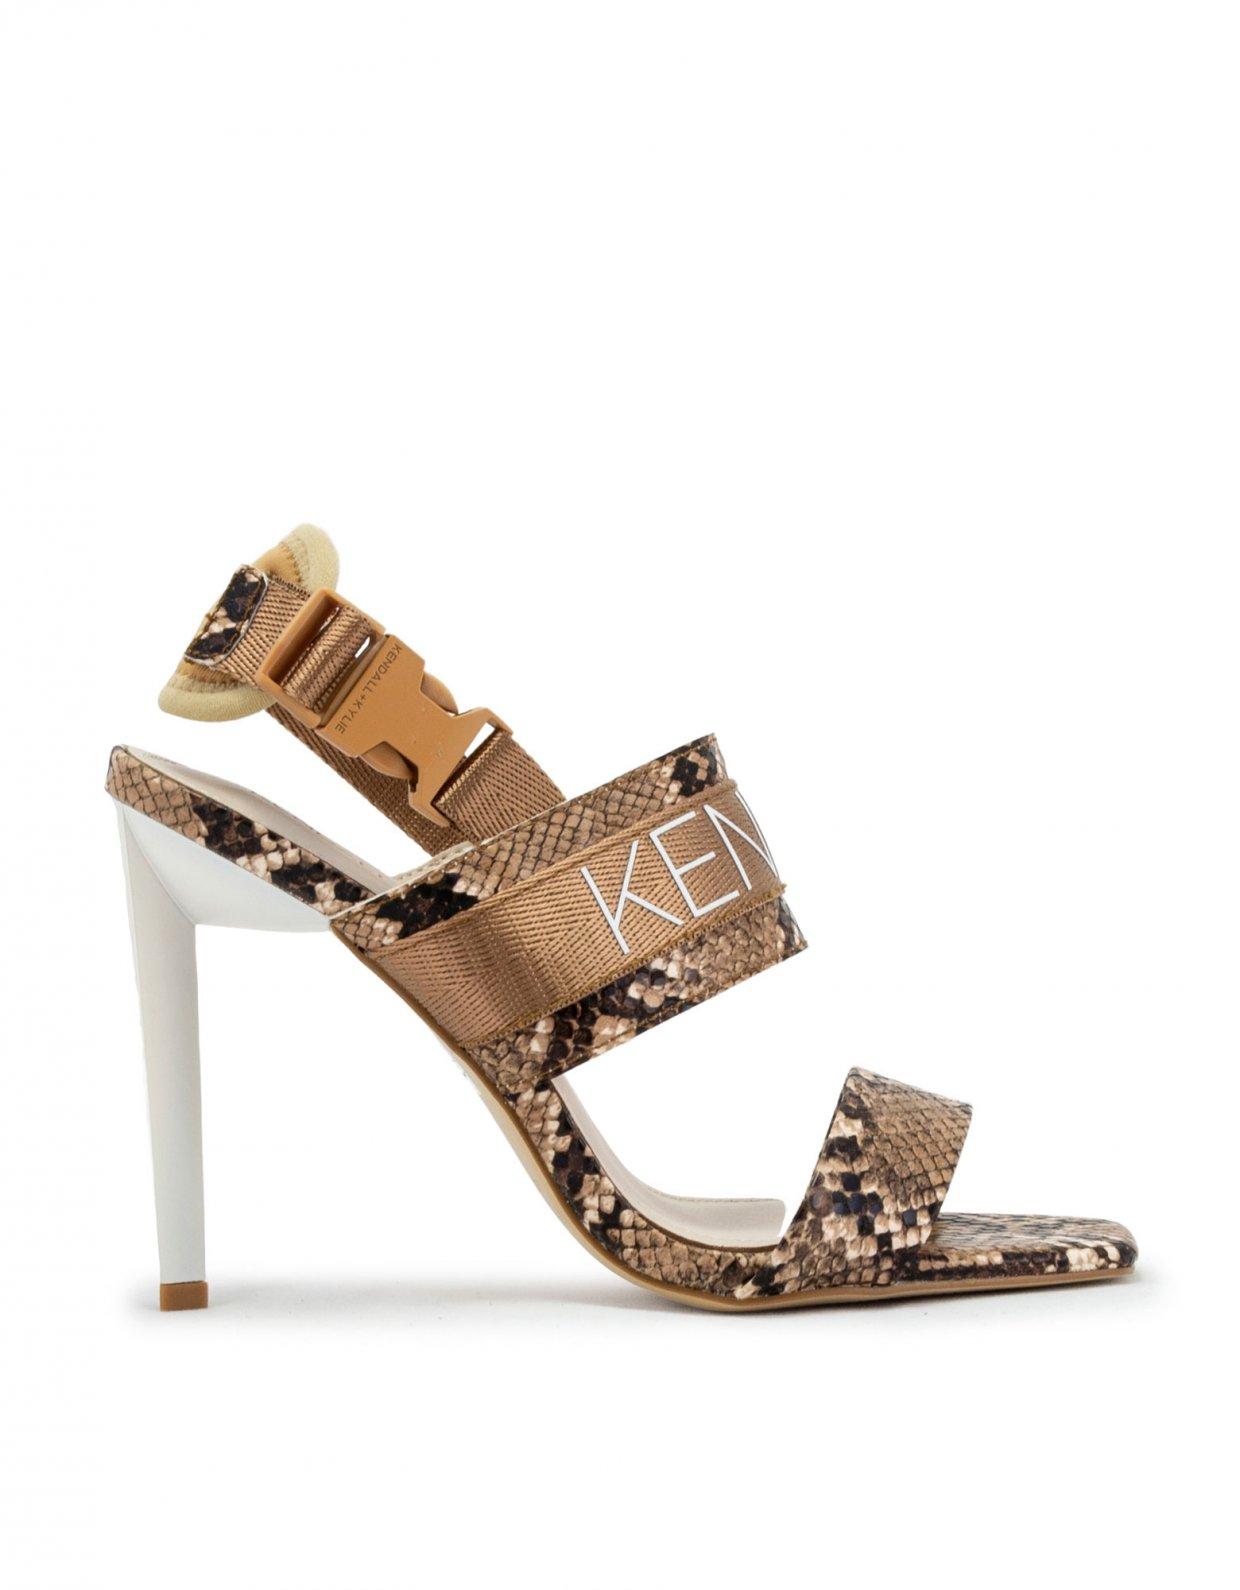 Kendall + Kylie Maddis snake sandal